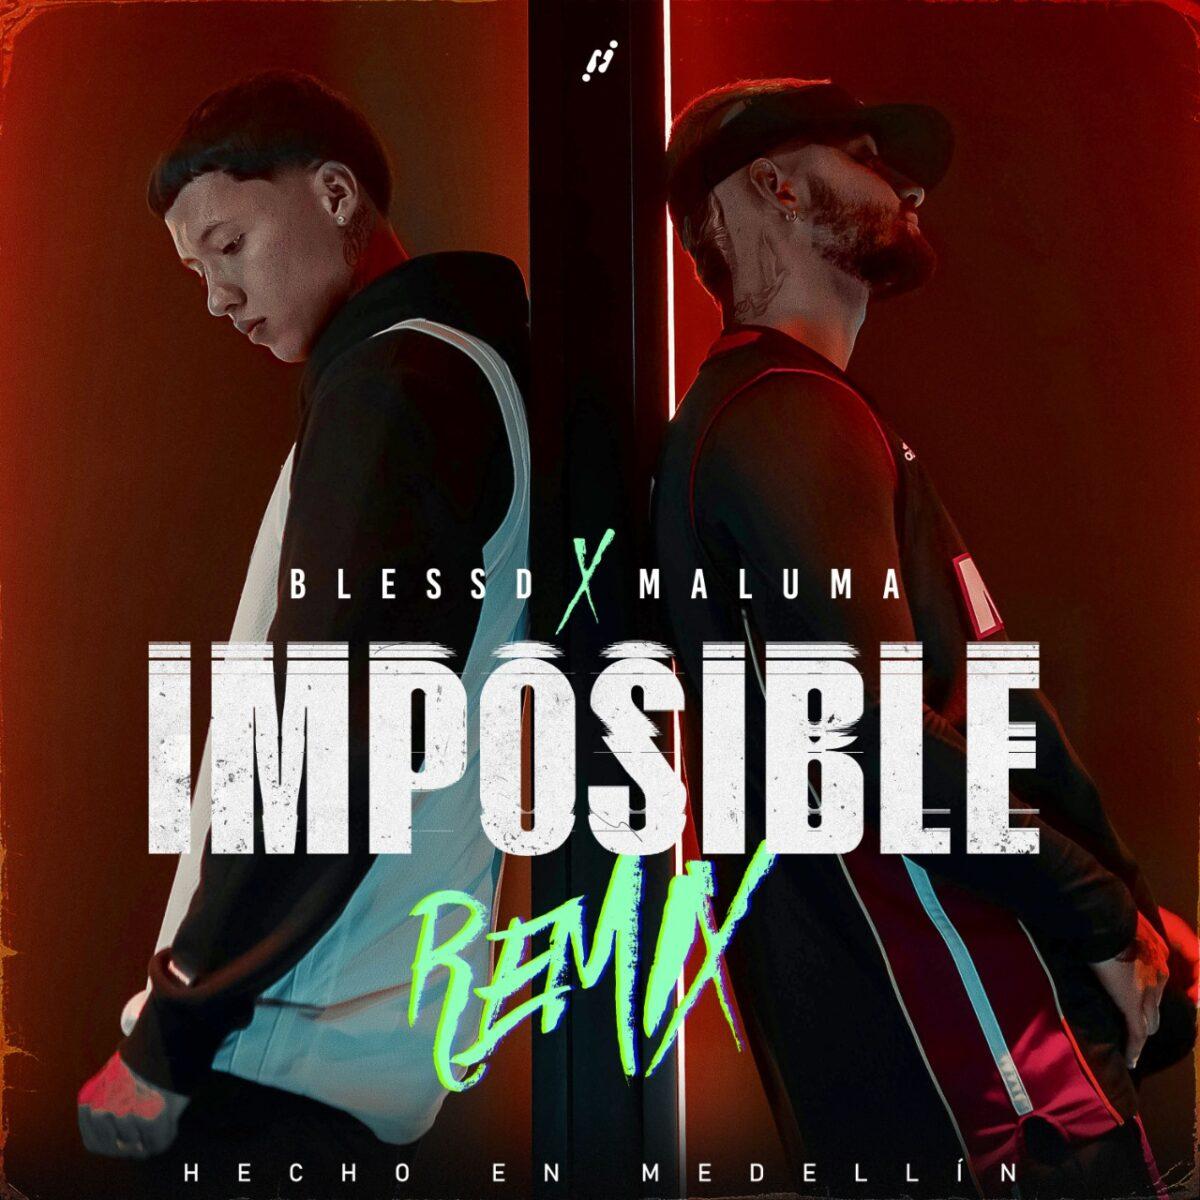 blessd maluma presentan imposible remix cover imposible remix 2021